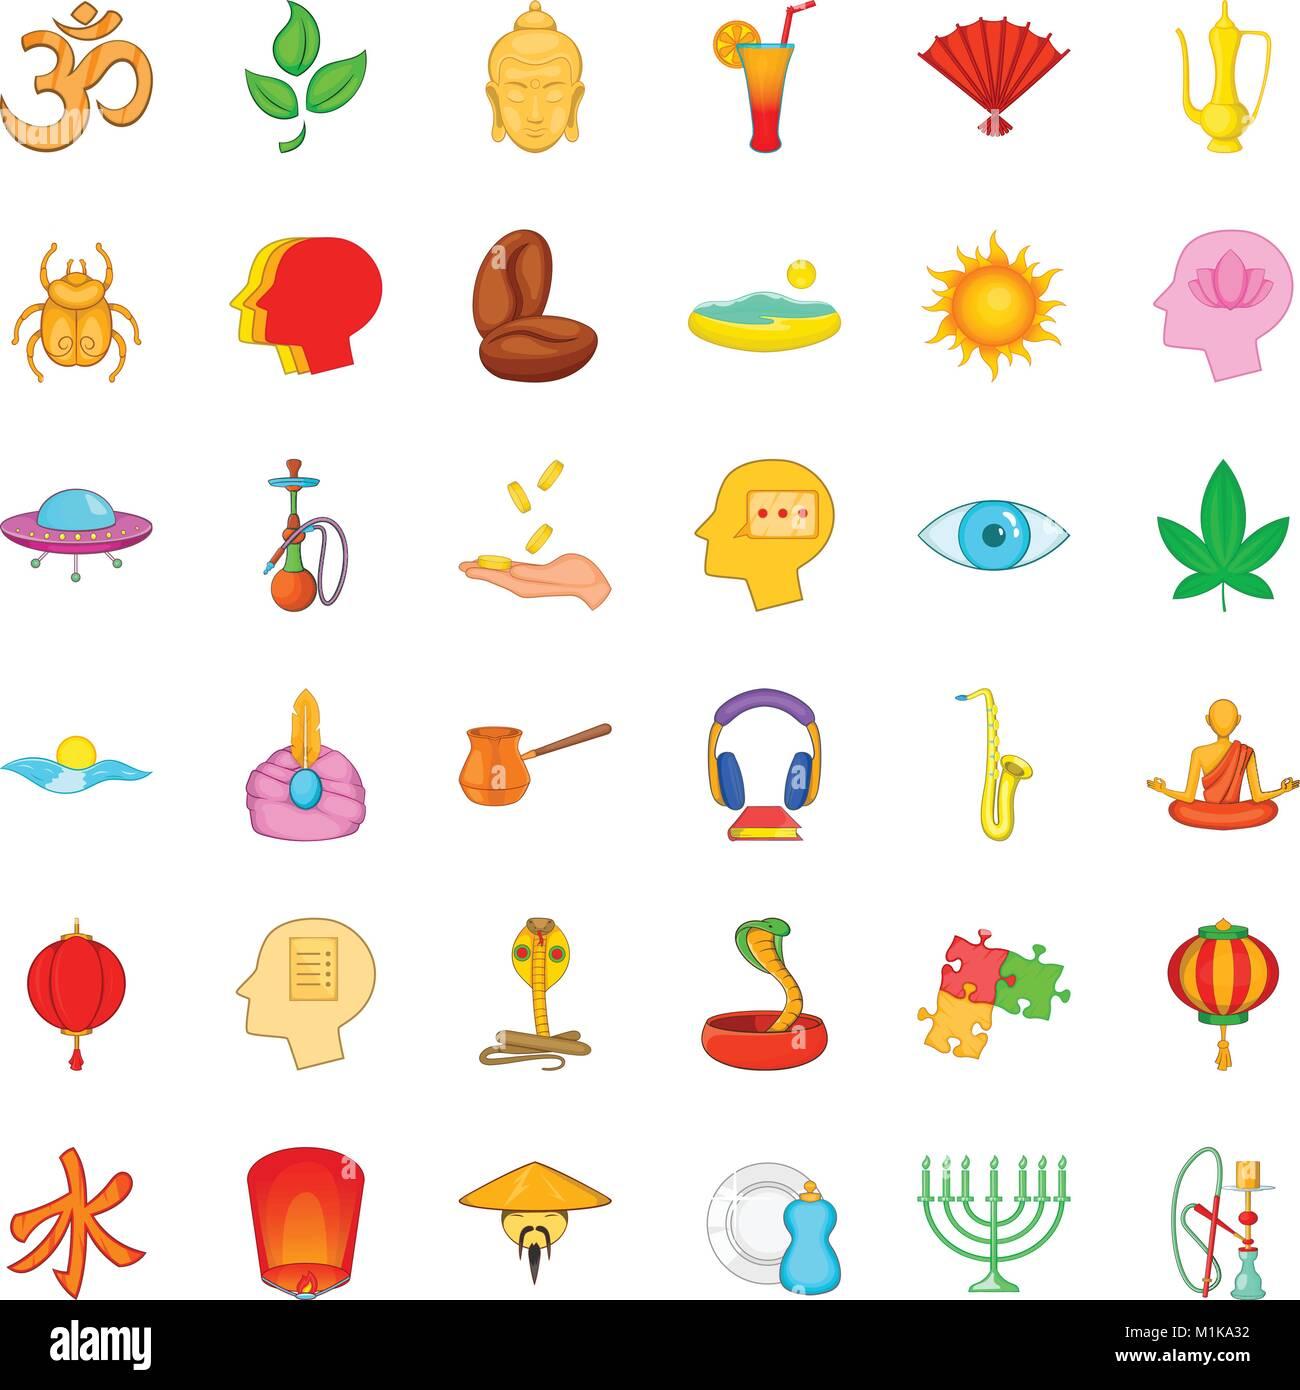 Contemplation icons set, cartoon style - Stock Vector